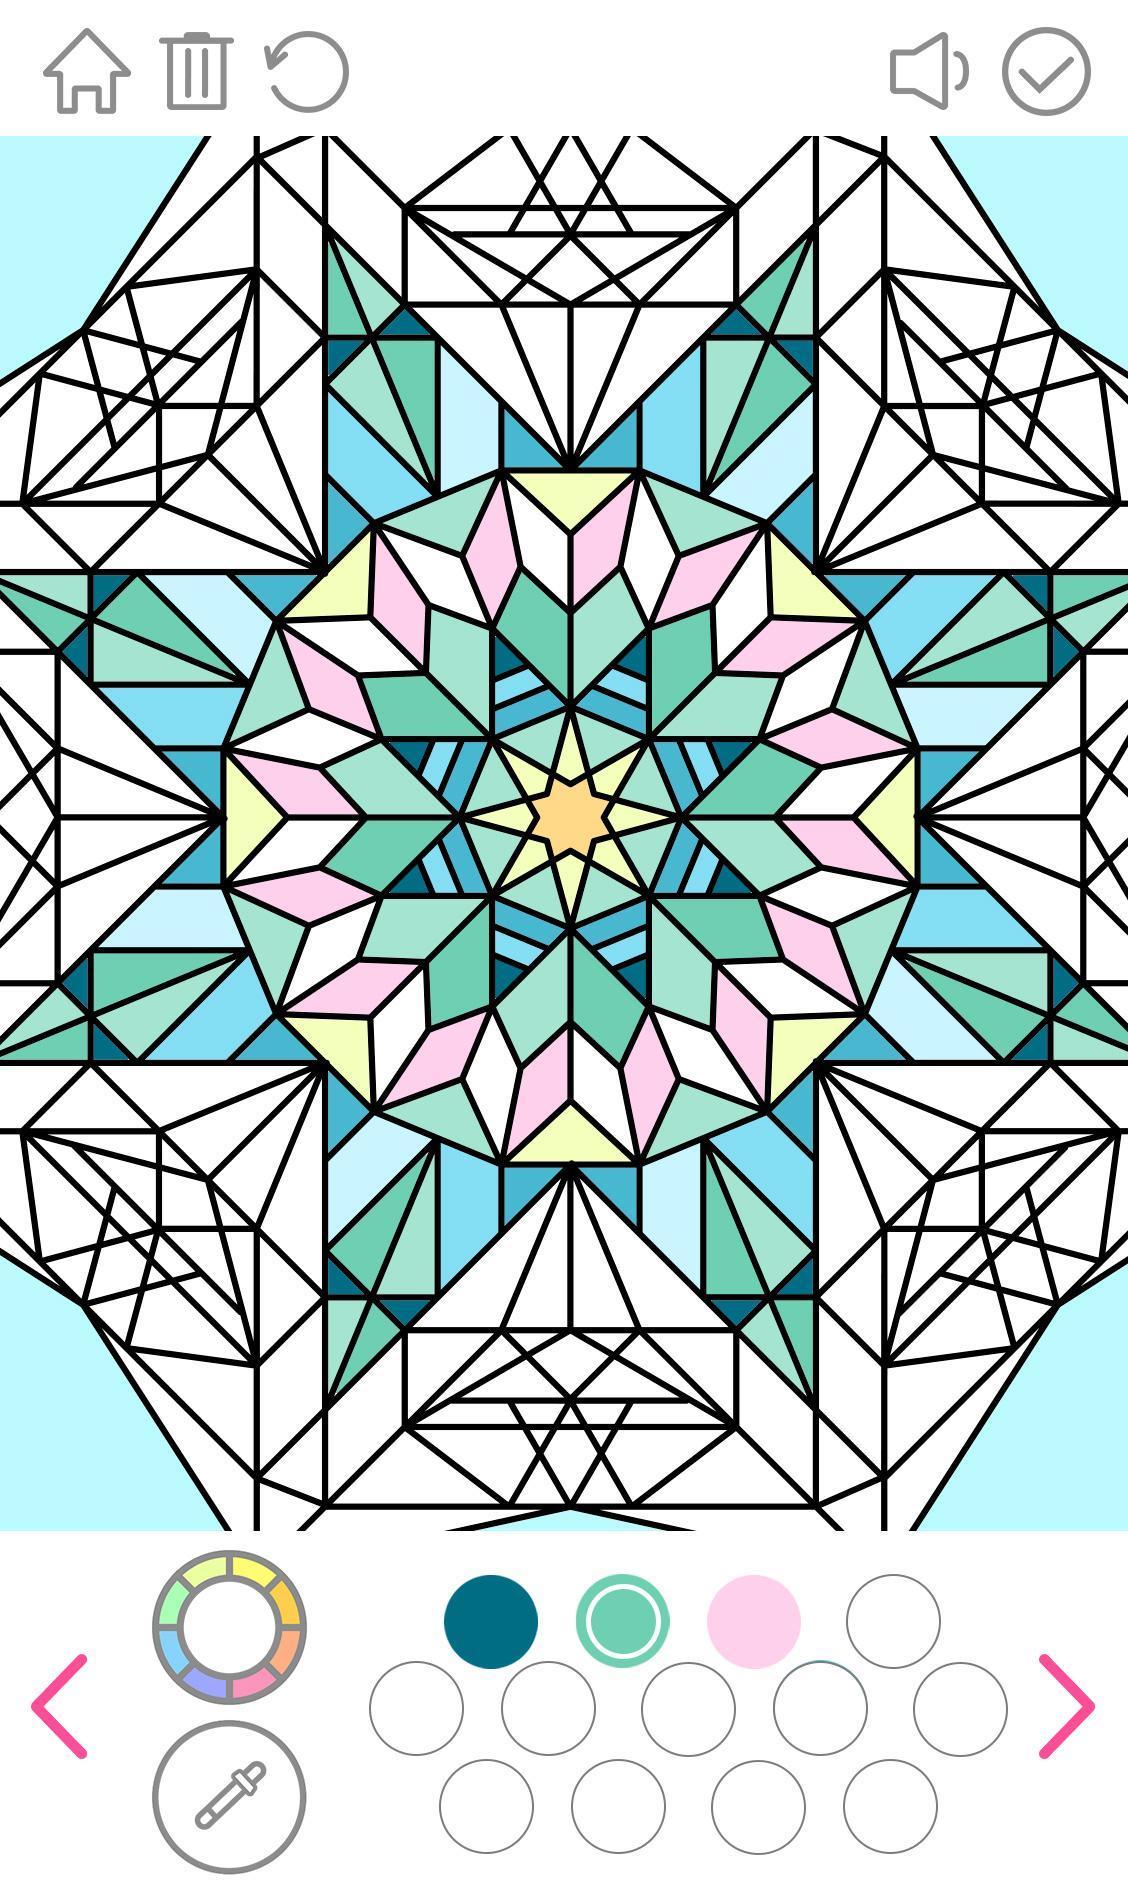 Mandala Coloring Book for Android - APK Download